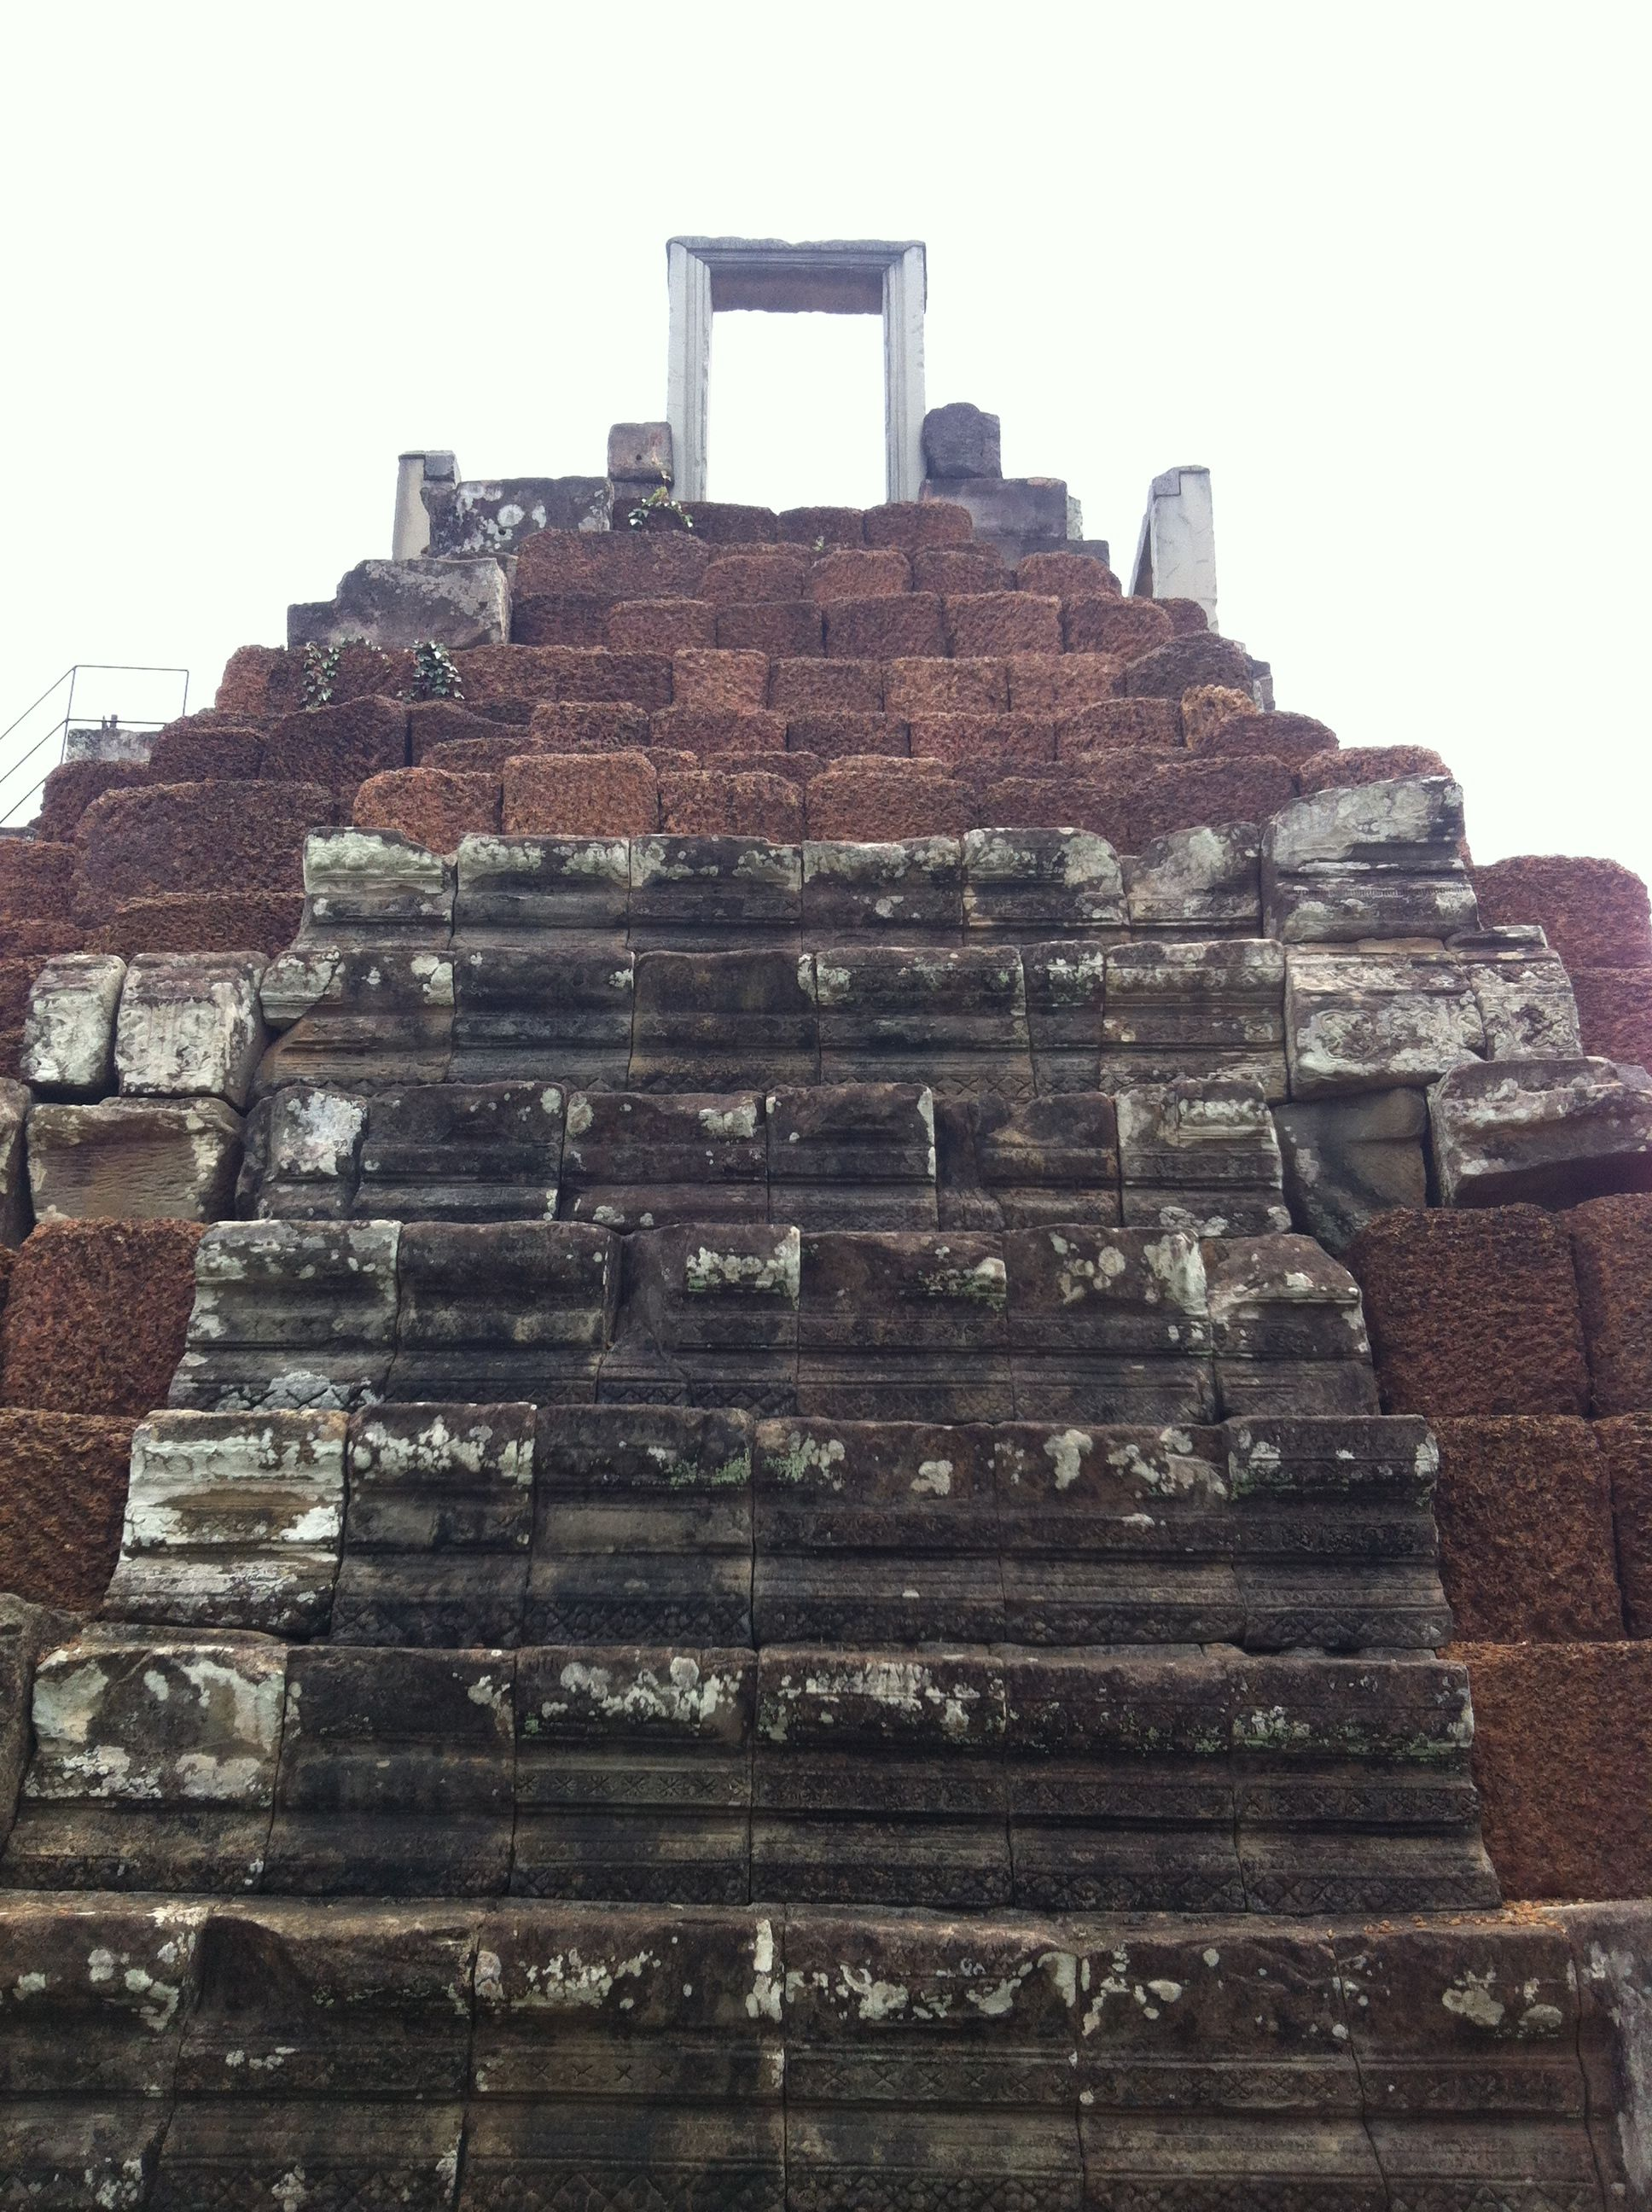 Chau Say Tevoda, Altar of Sacrifice??